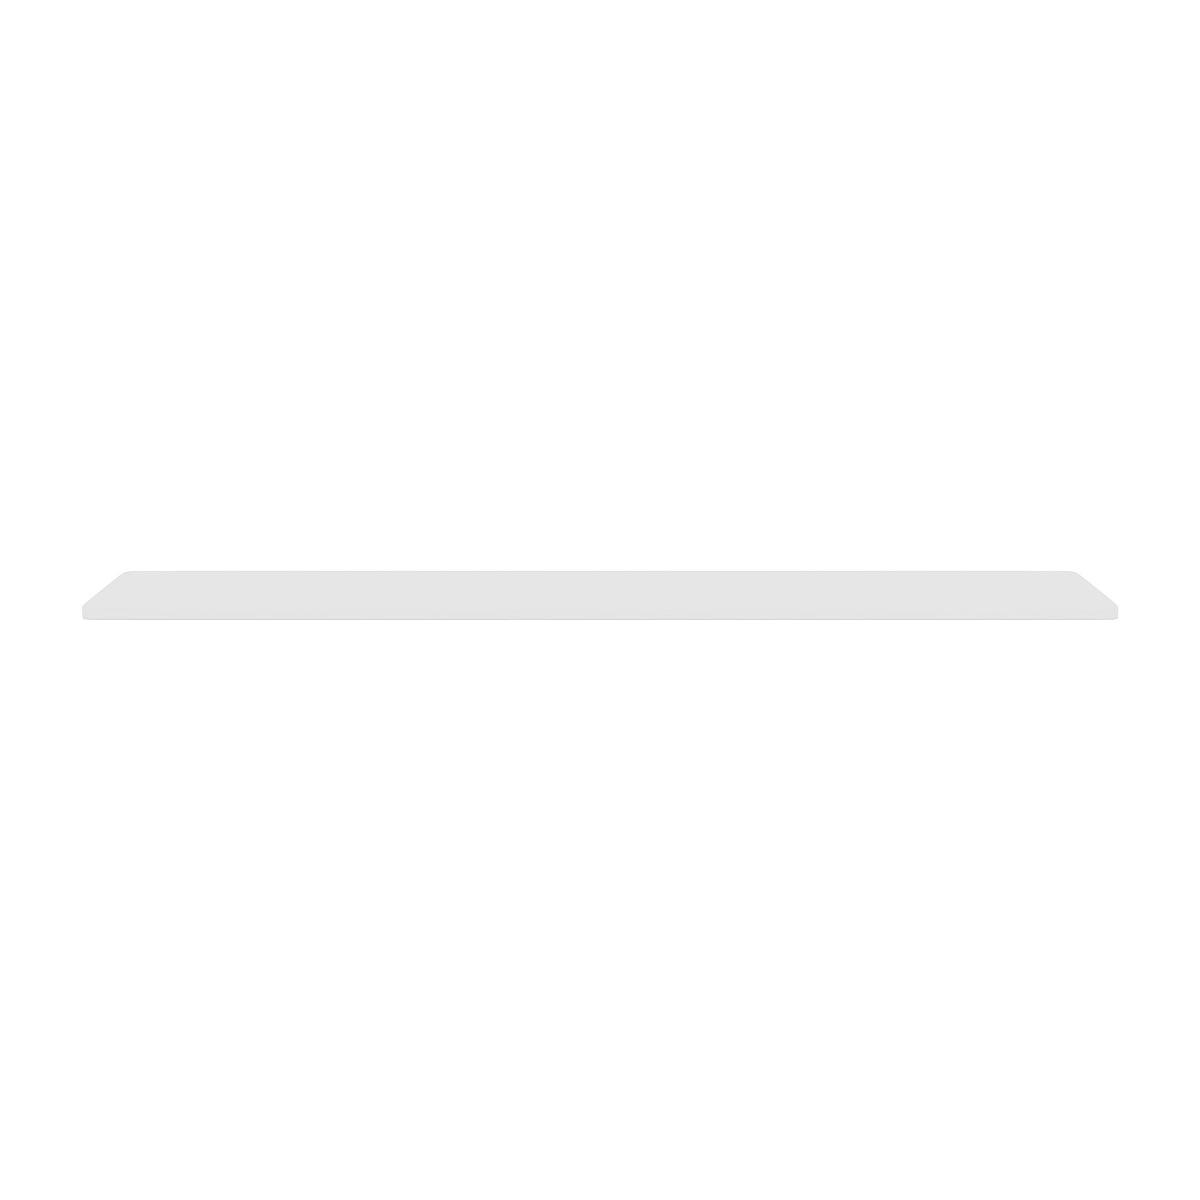 Montana Toppskiva Wire 70,1x18,8cm New White